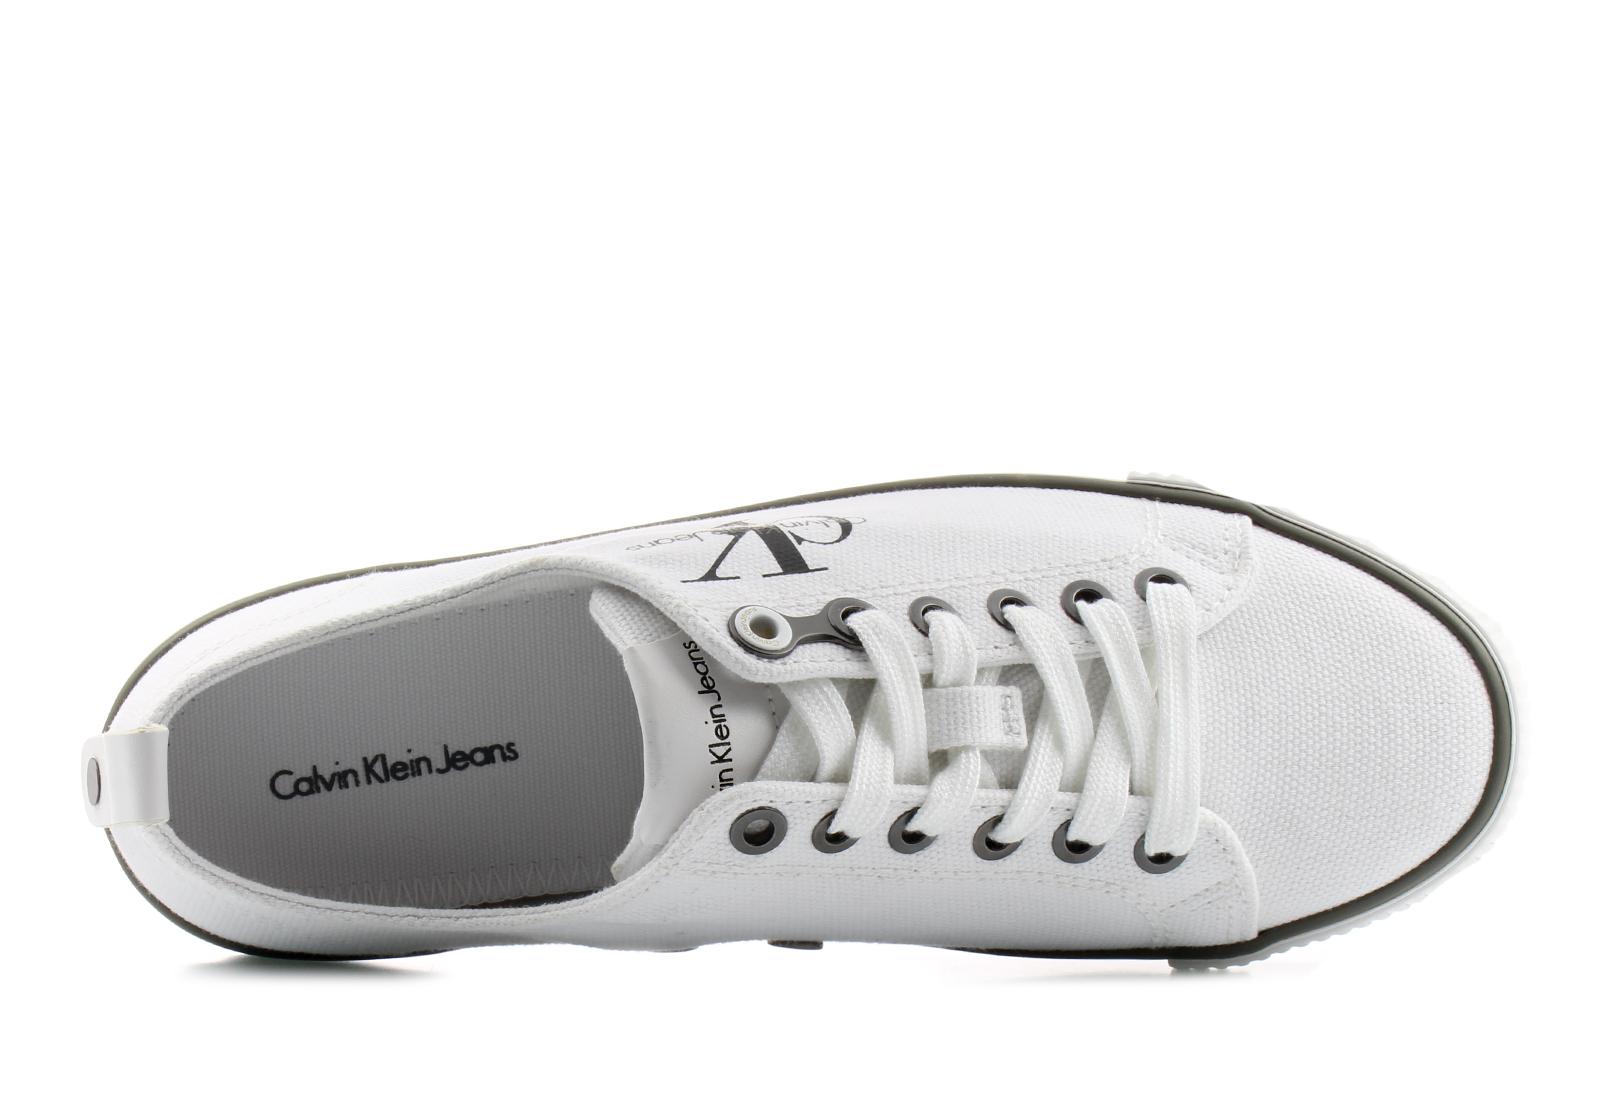 Turnschuhe CALVIN KLEIN JEANS Dora R3556 White